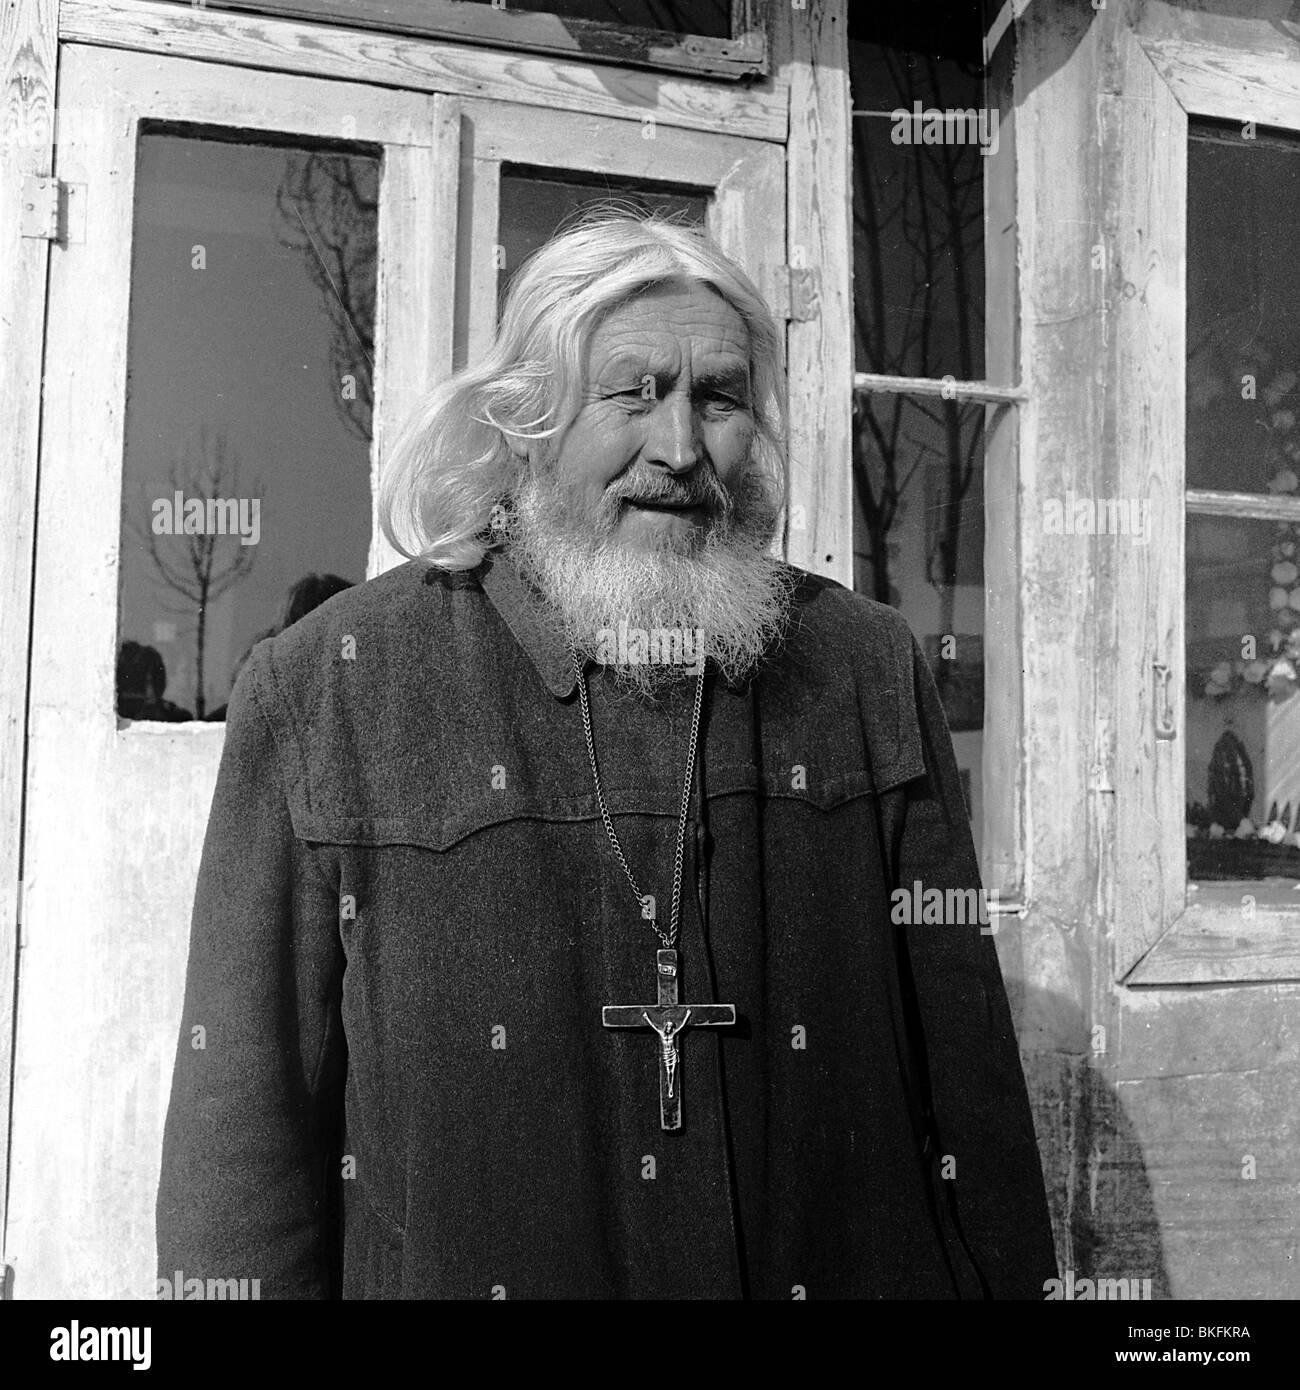 Timofey (born Timofey Vasilevich Prochorov), 22.1.1894 - 13.7.2004, Russian hermit in Munich, Germany, half length, - Stock Image